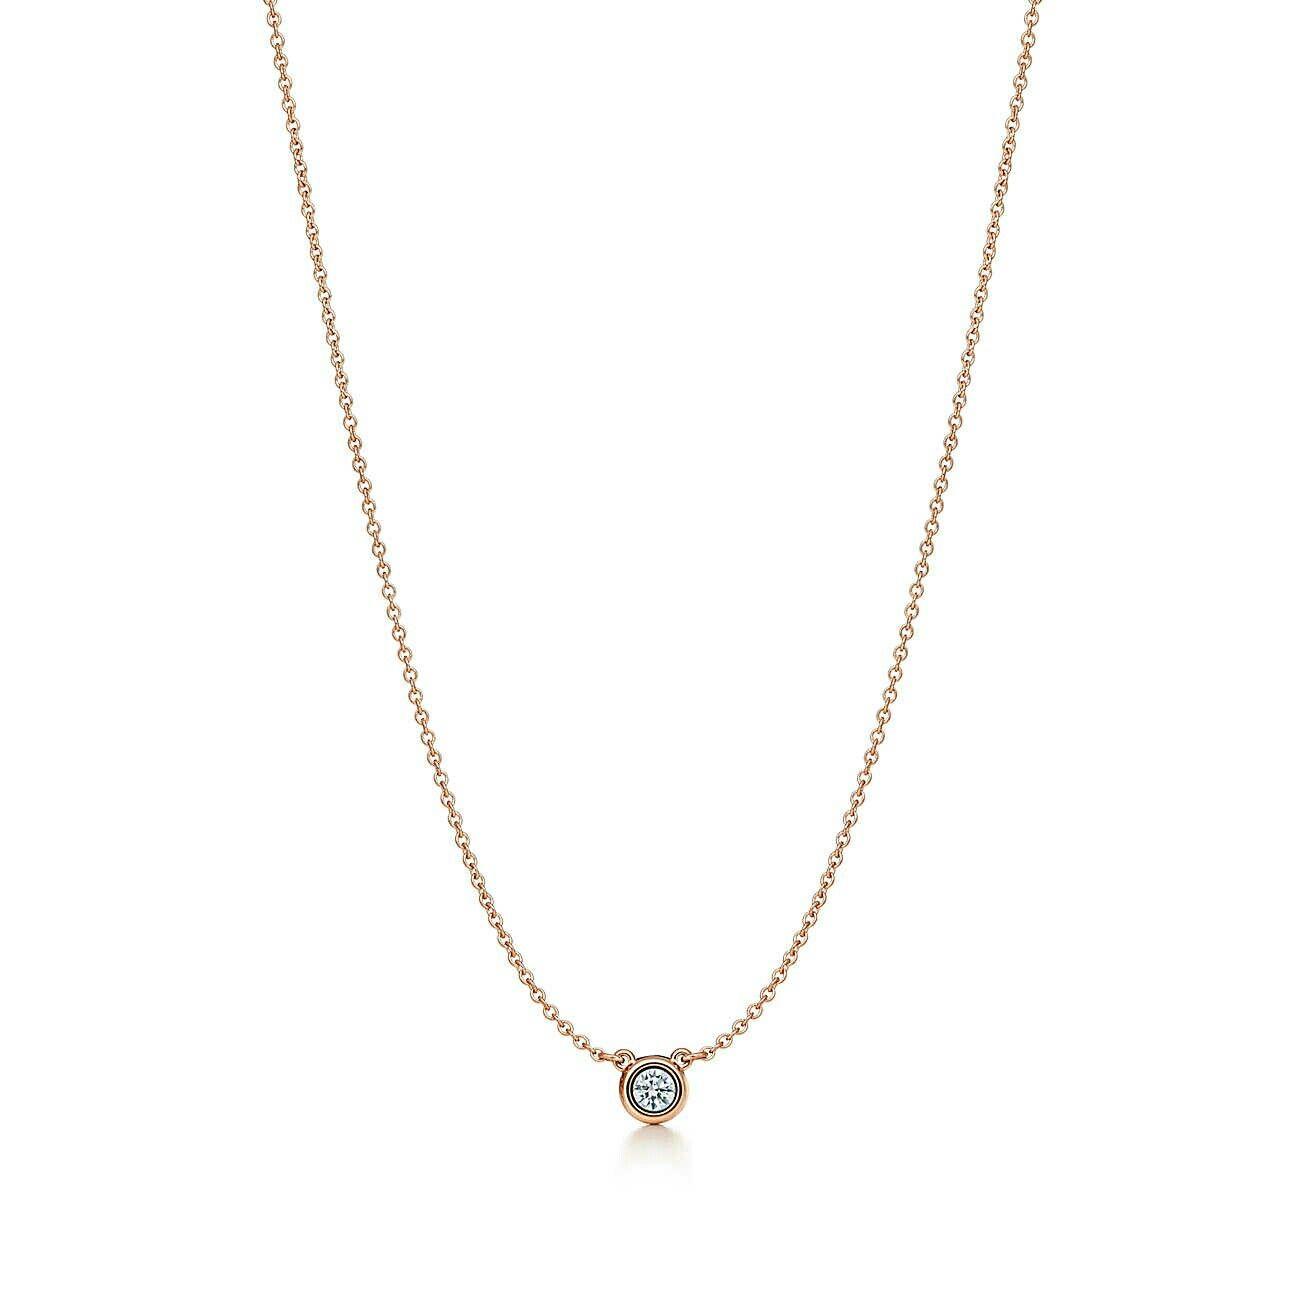 20b15029b elesa perreti diamonds by the yard pendant in 18k rose gold by tiffany&co .  $1025